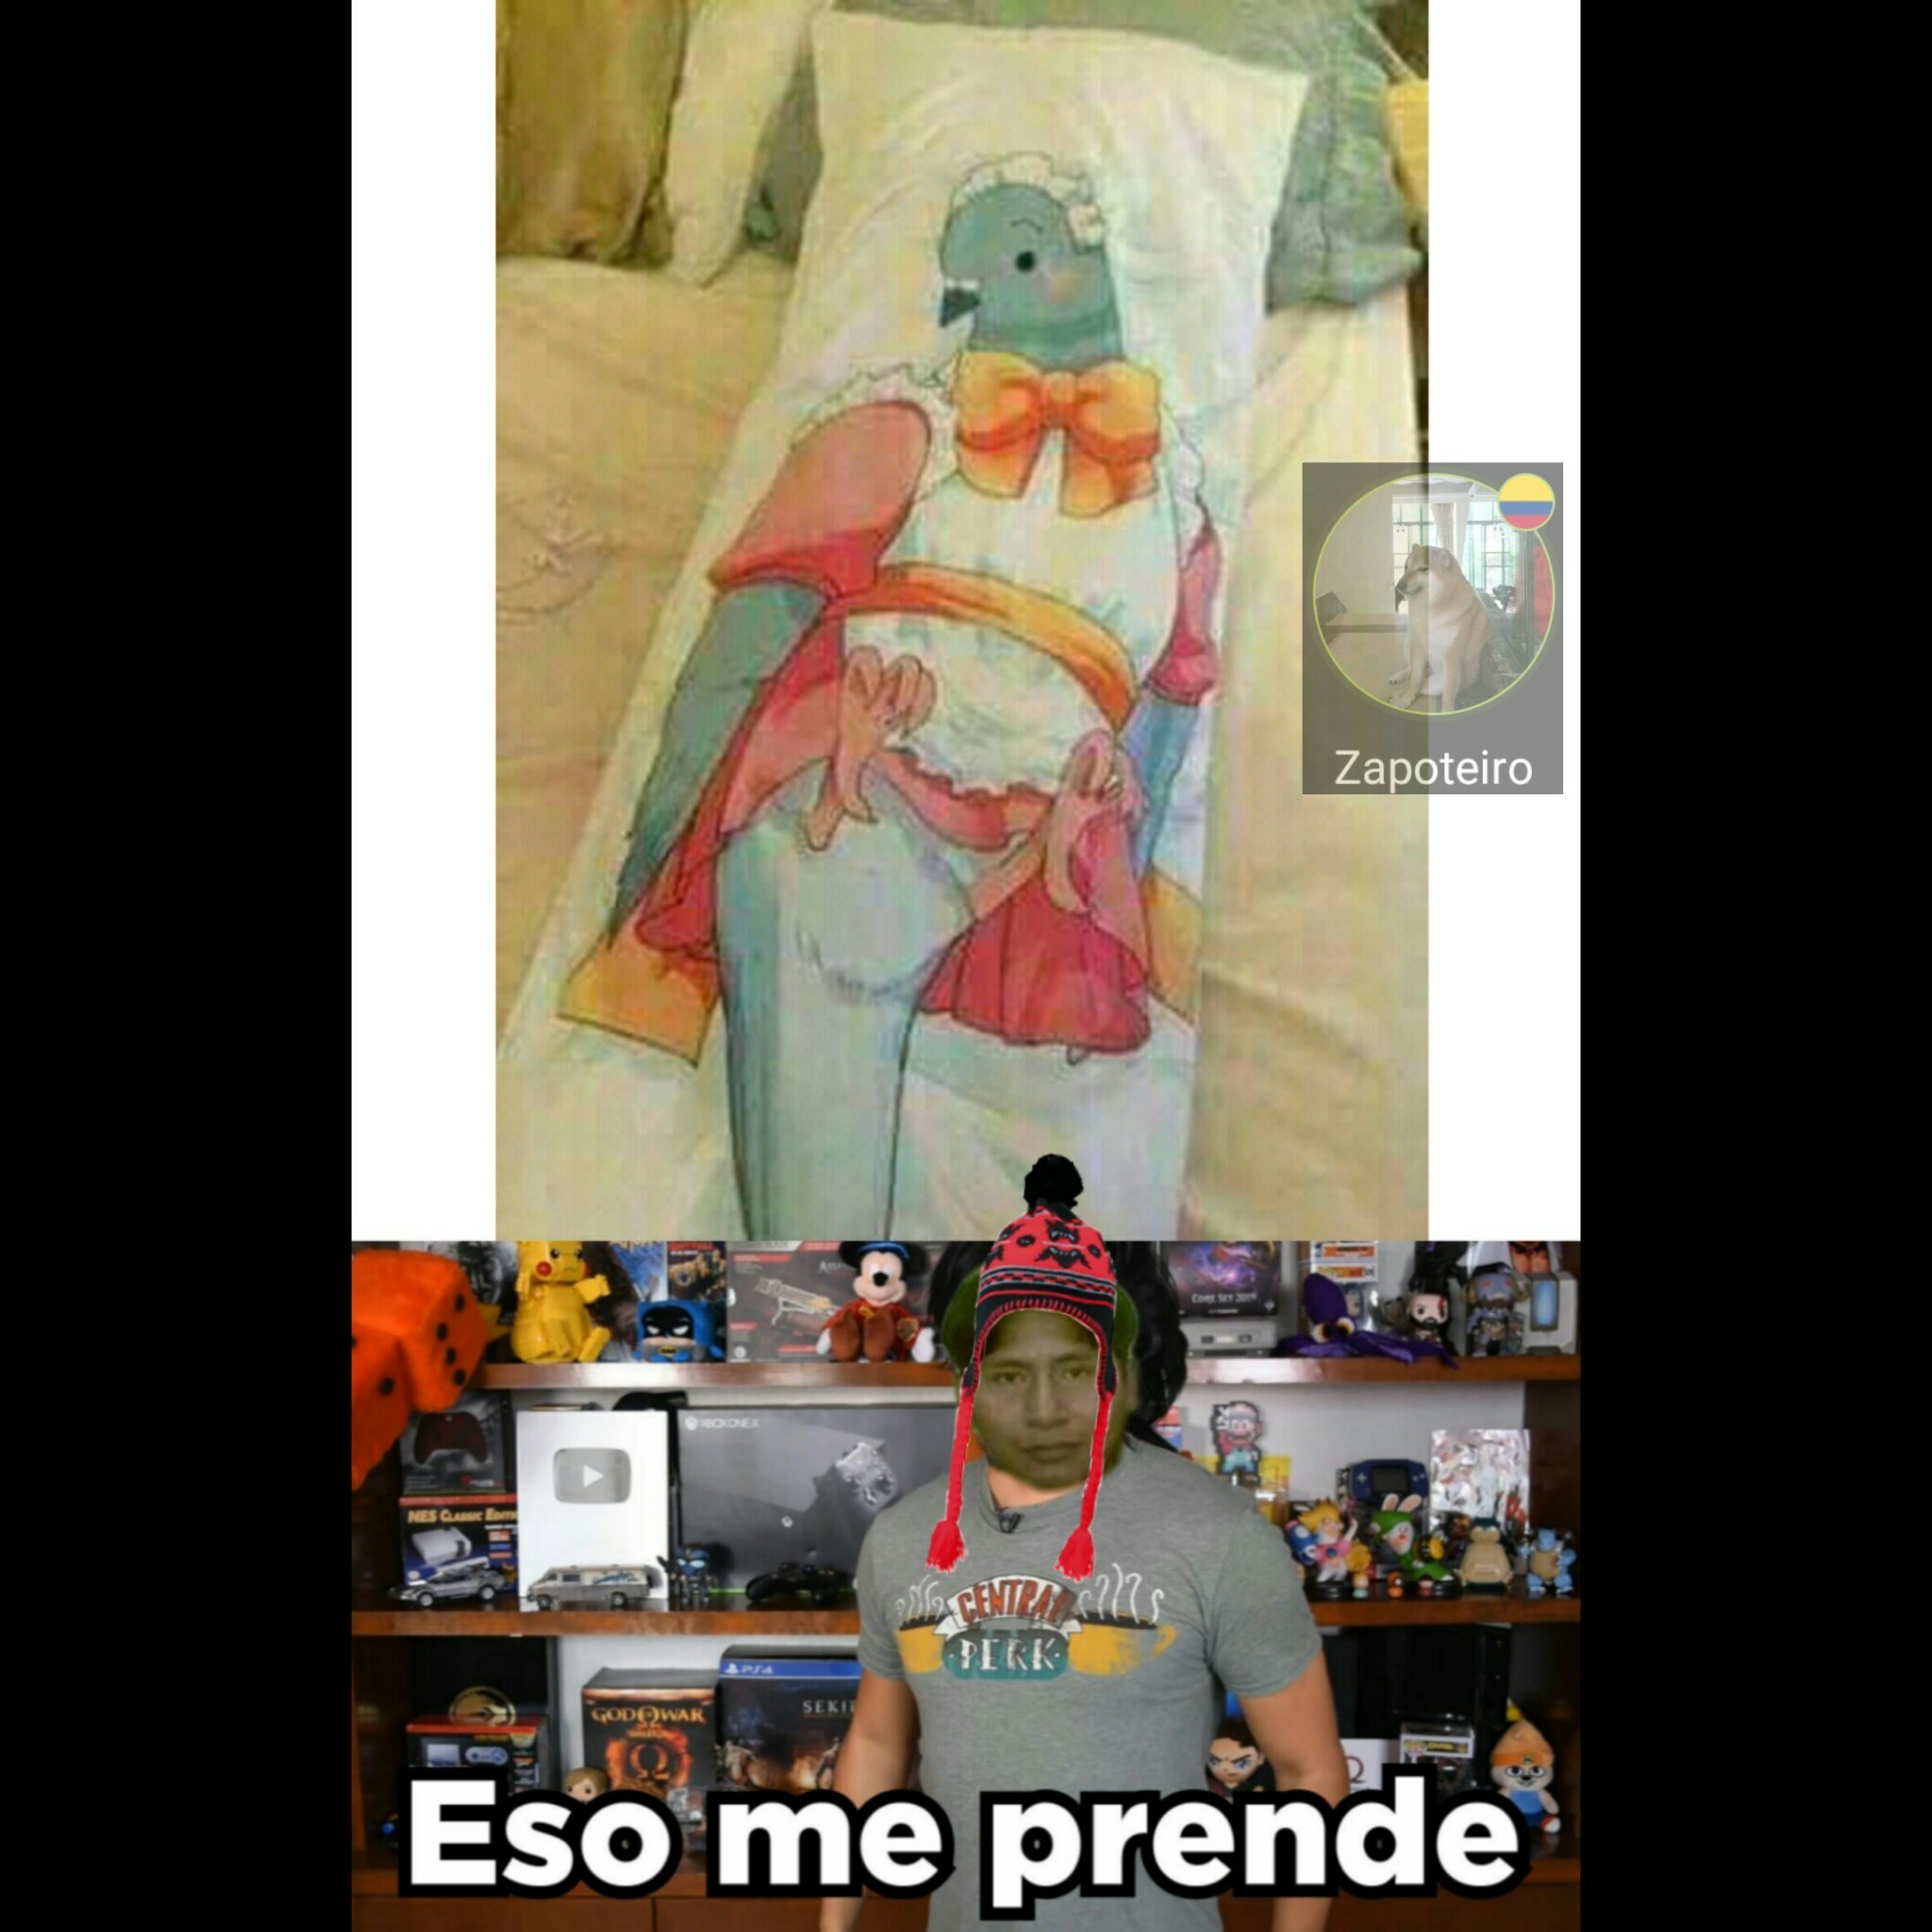 D: - meme